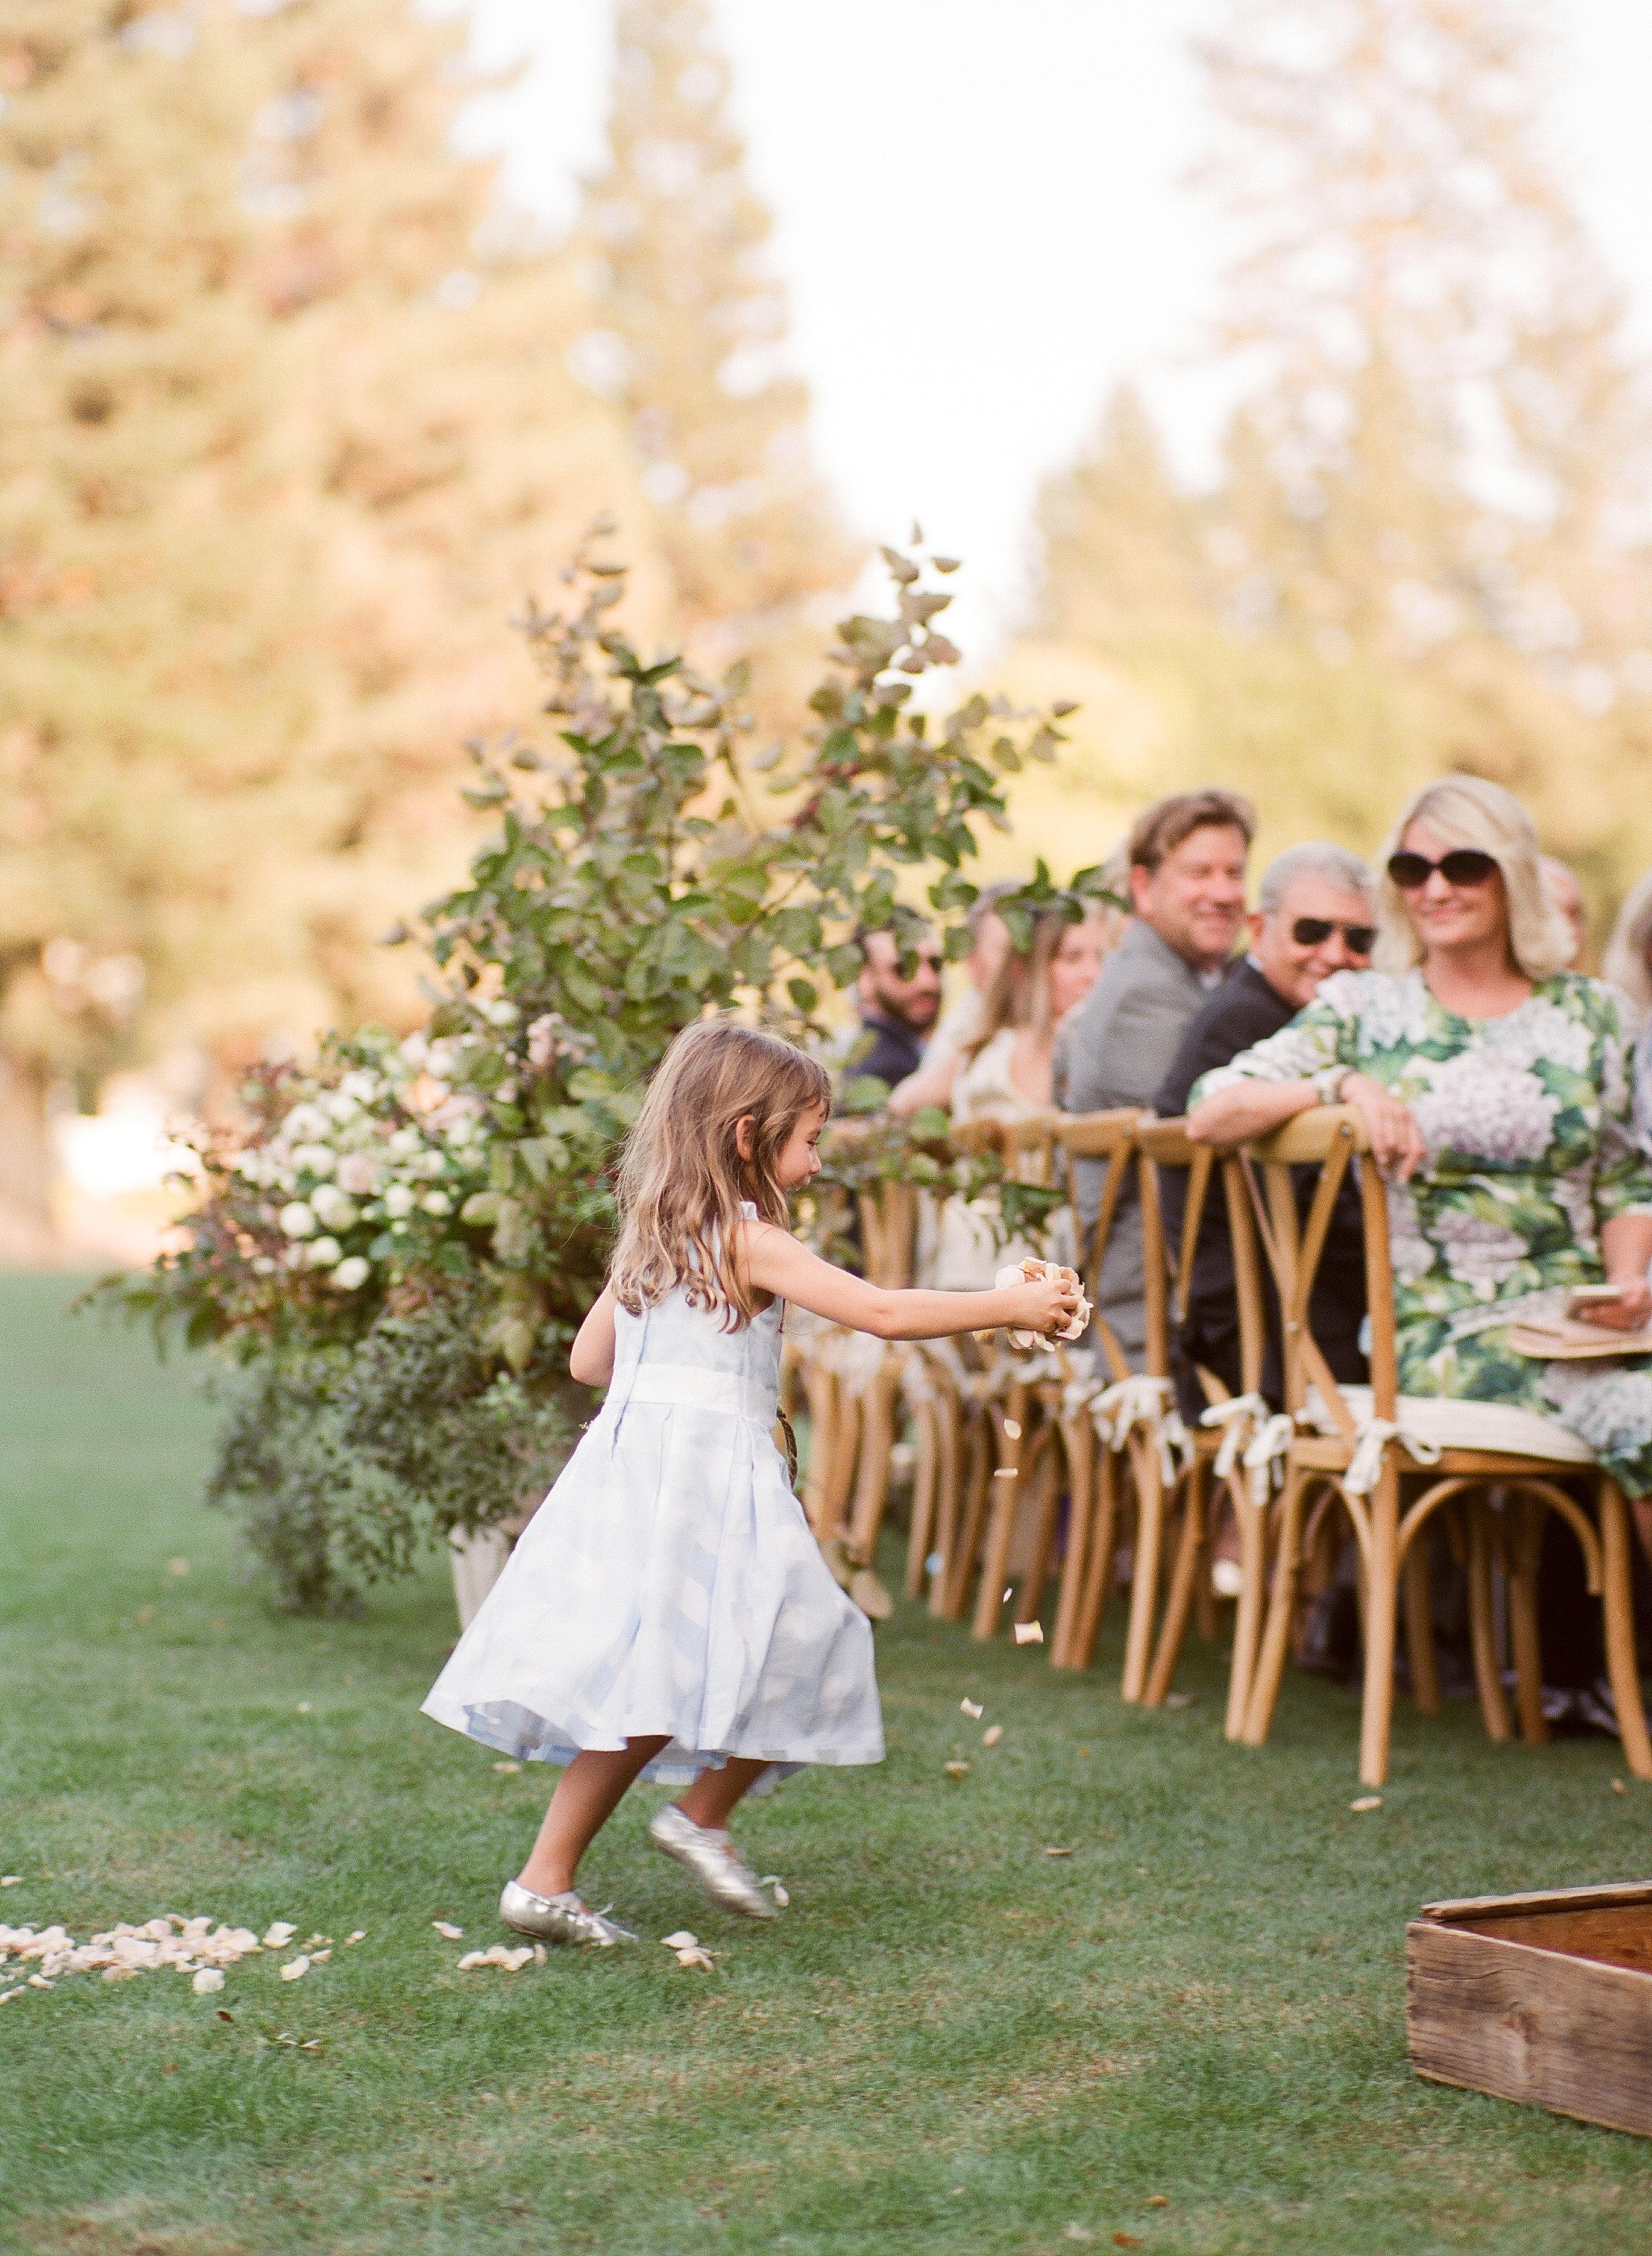 caitlin michael wedding flower girl